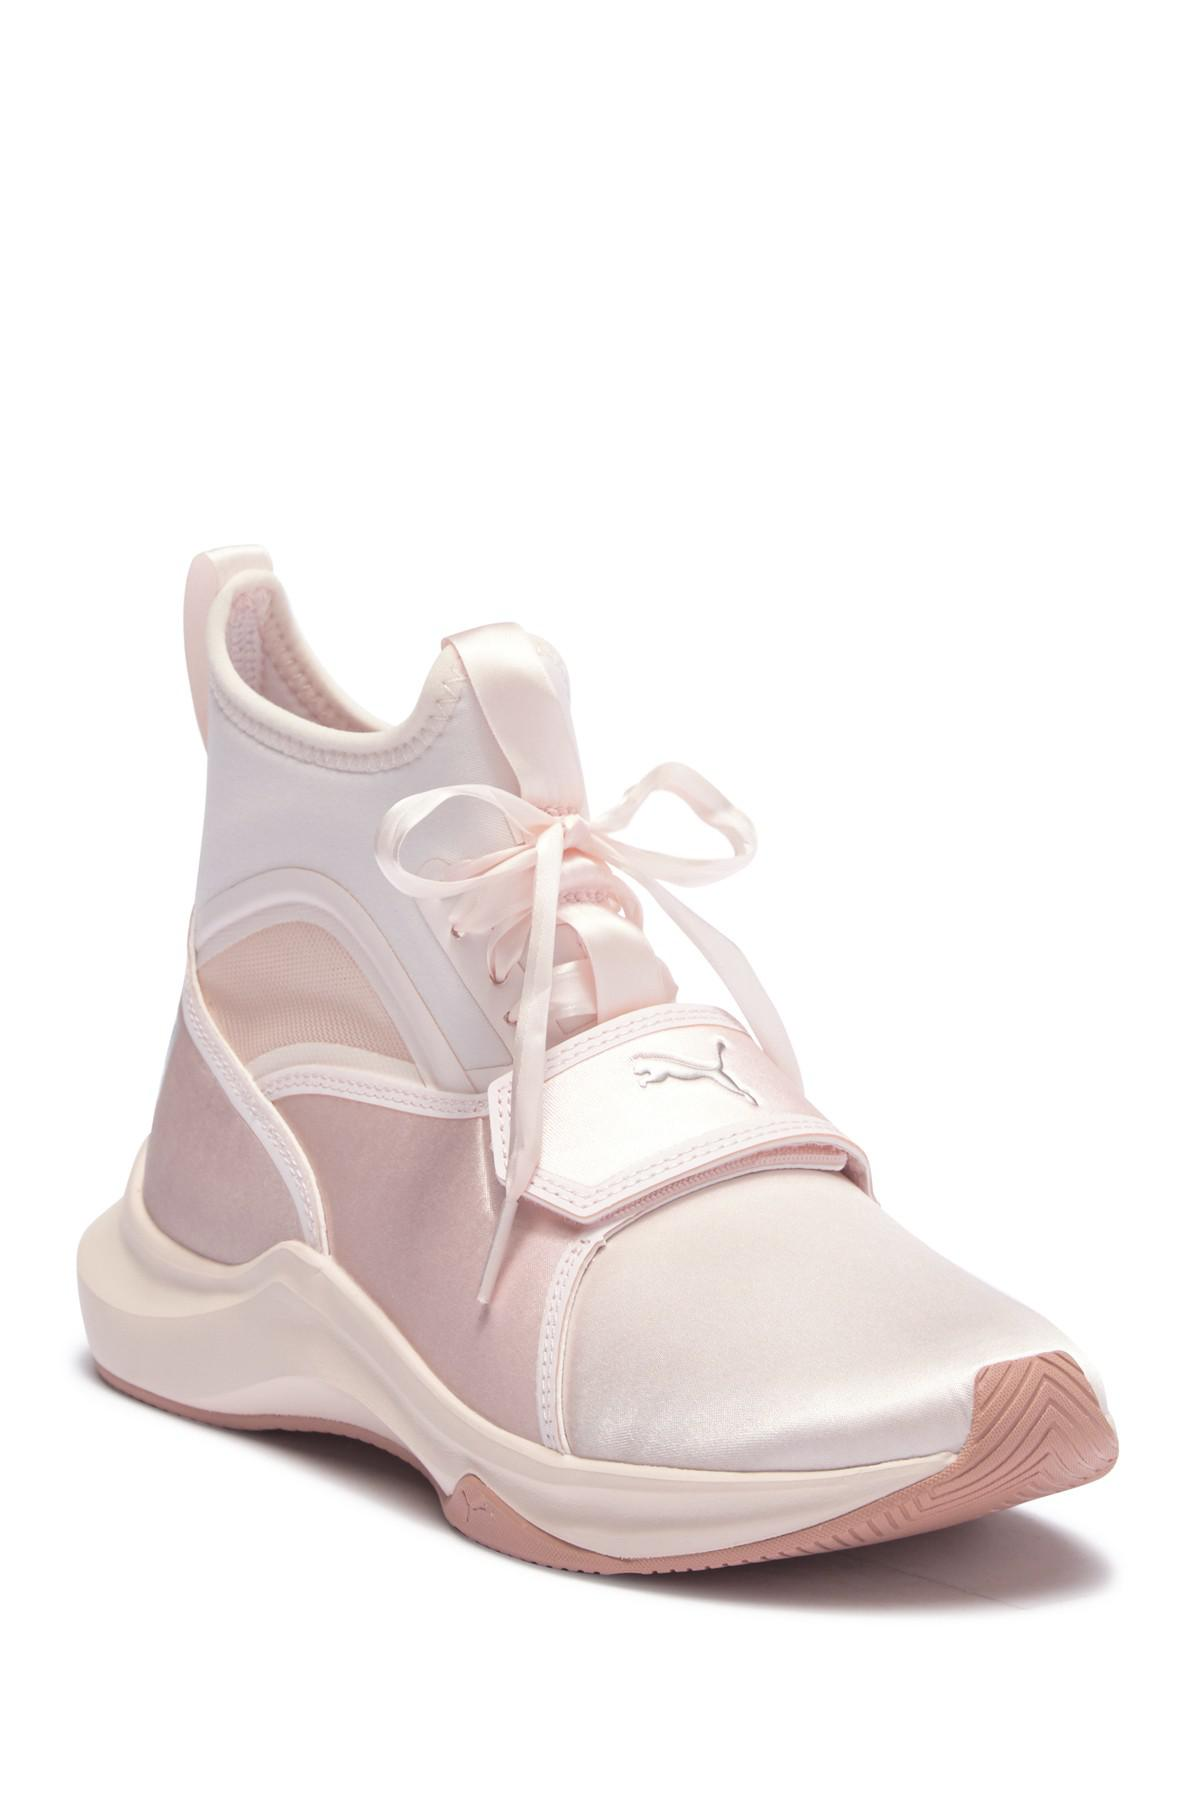 5a3352a3cb6 Lyst - PUMA Phenom Satin Lace Sneaker in White